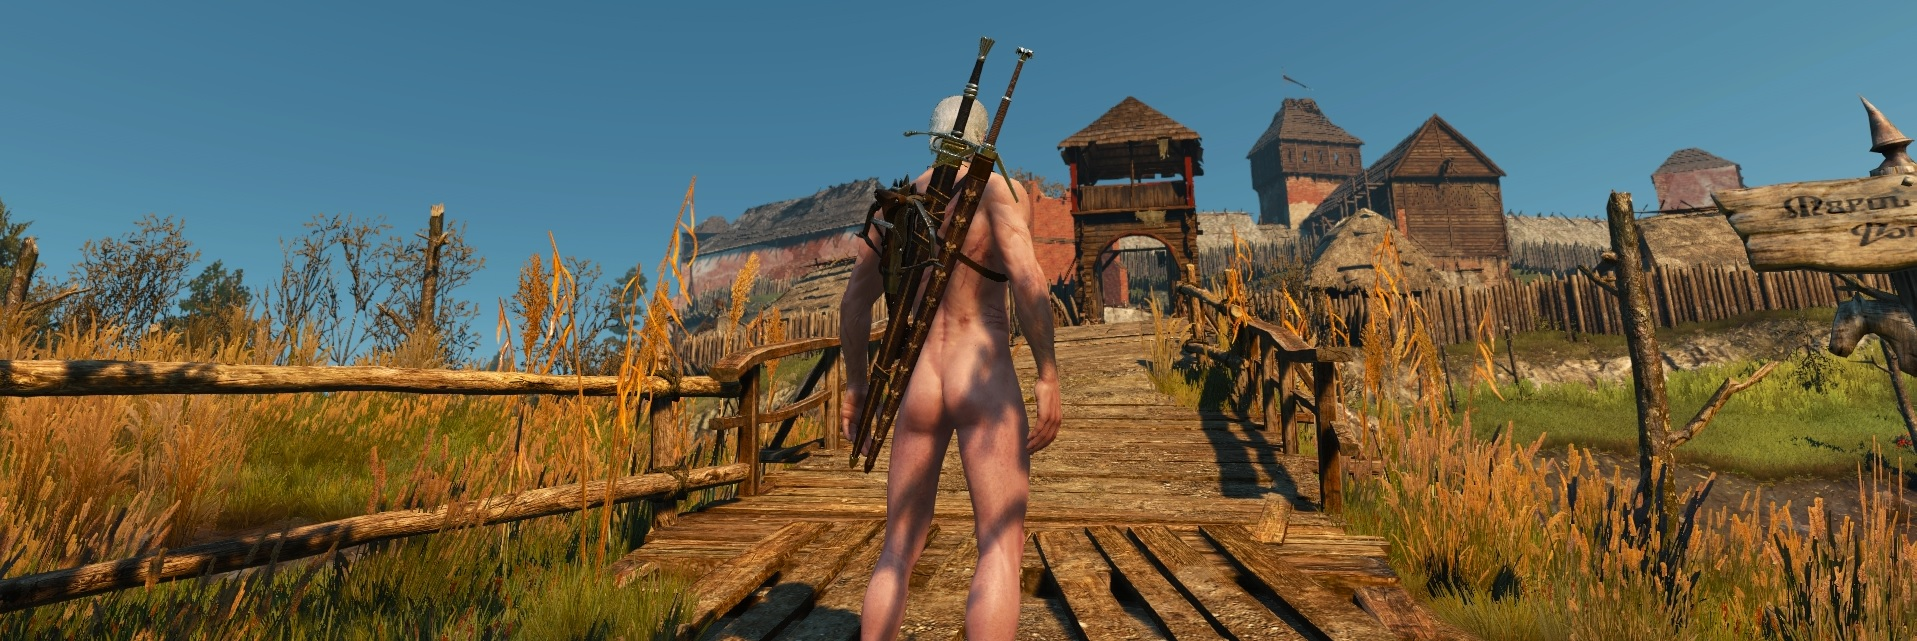 tomb raider nude mod